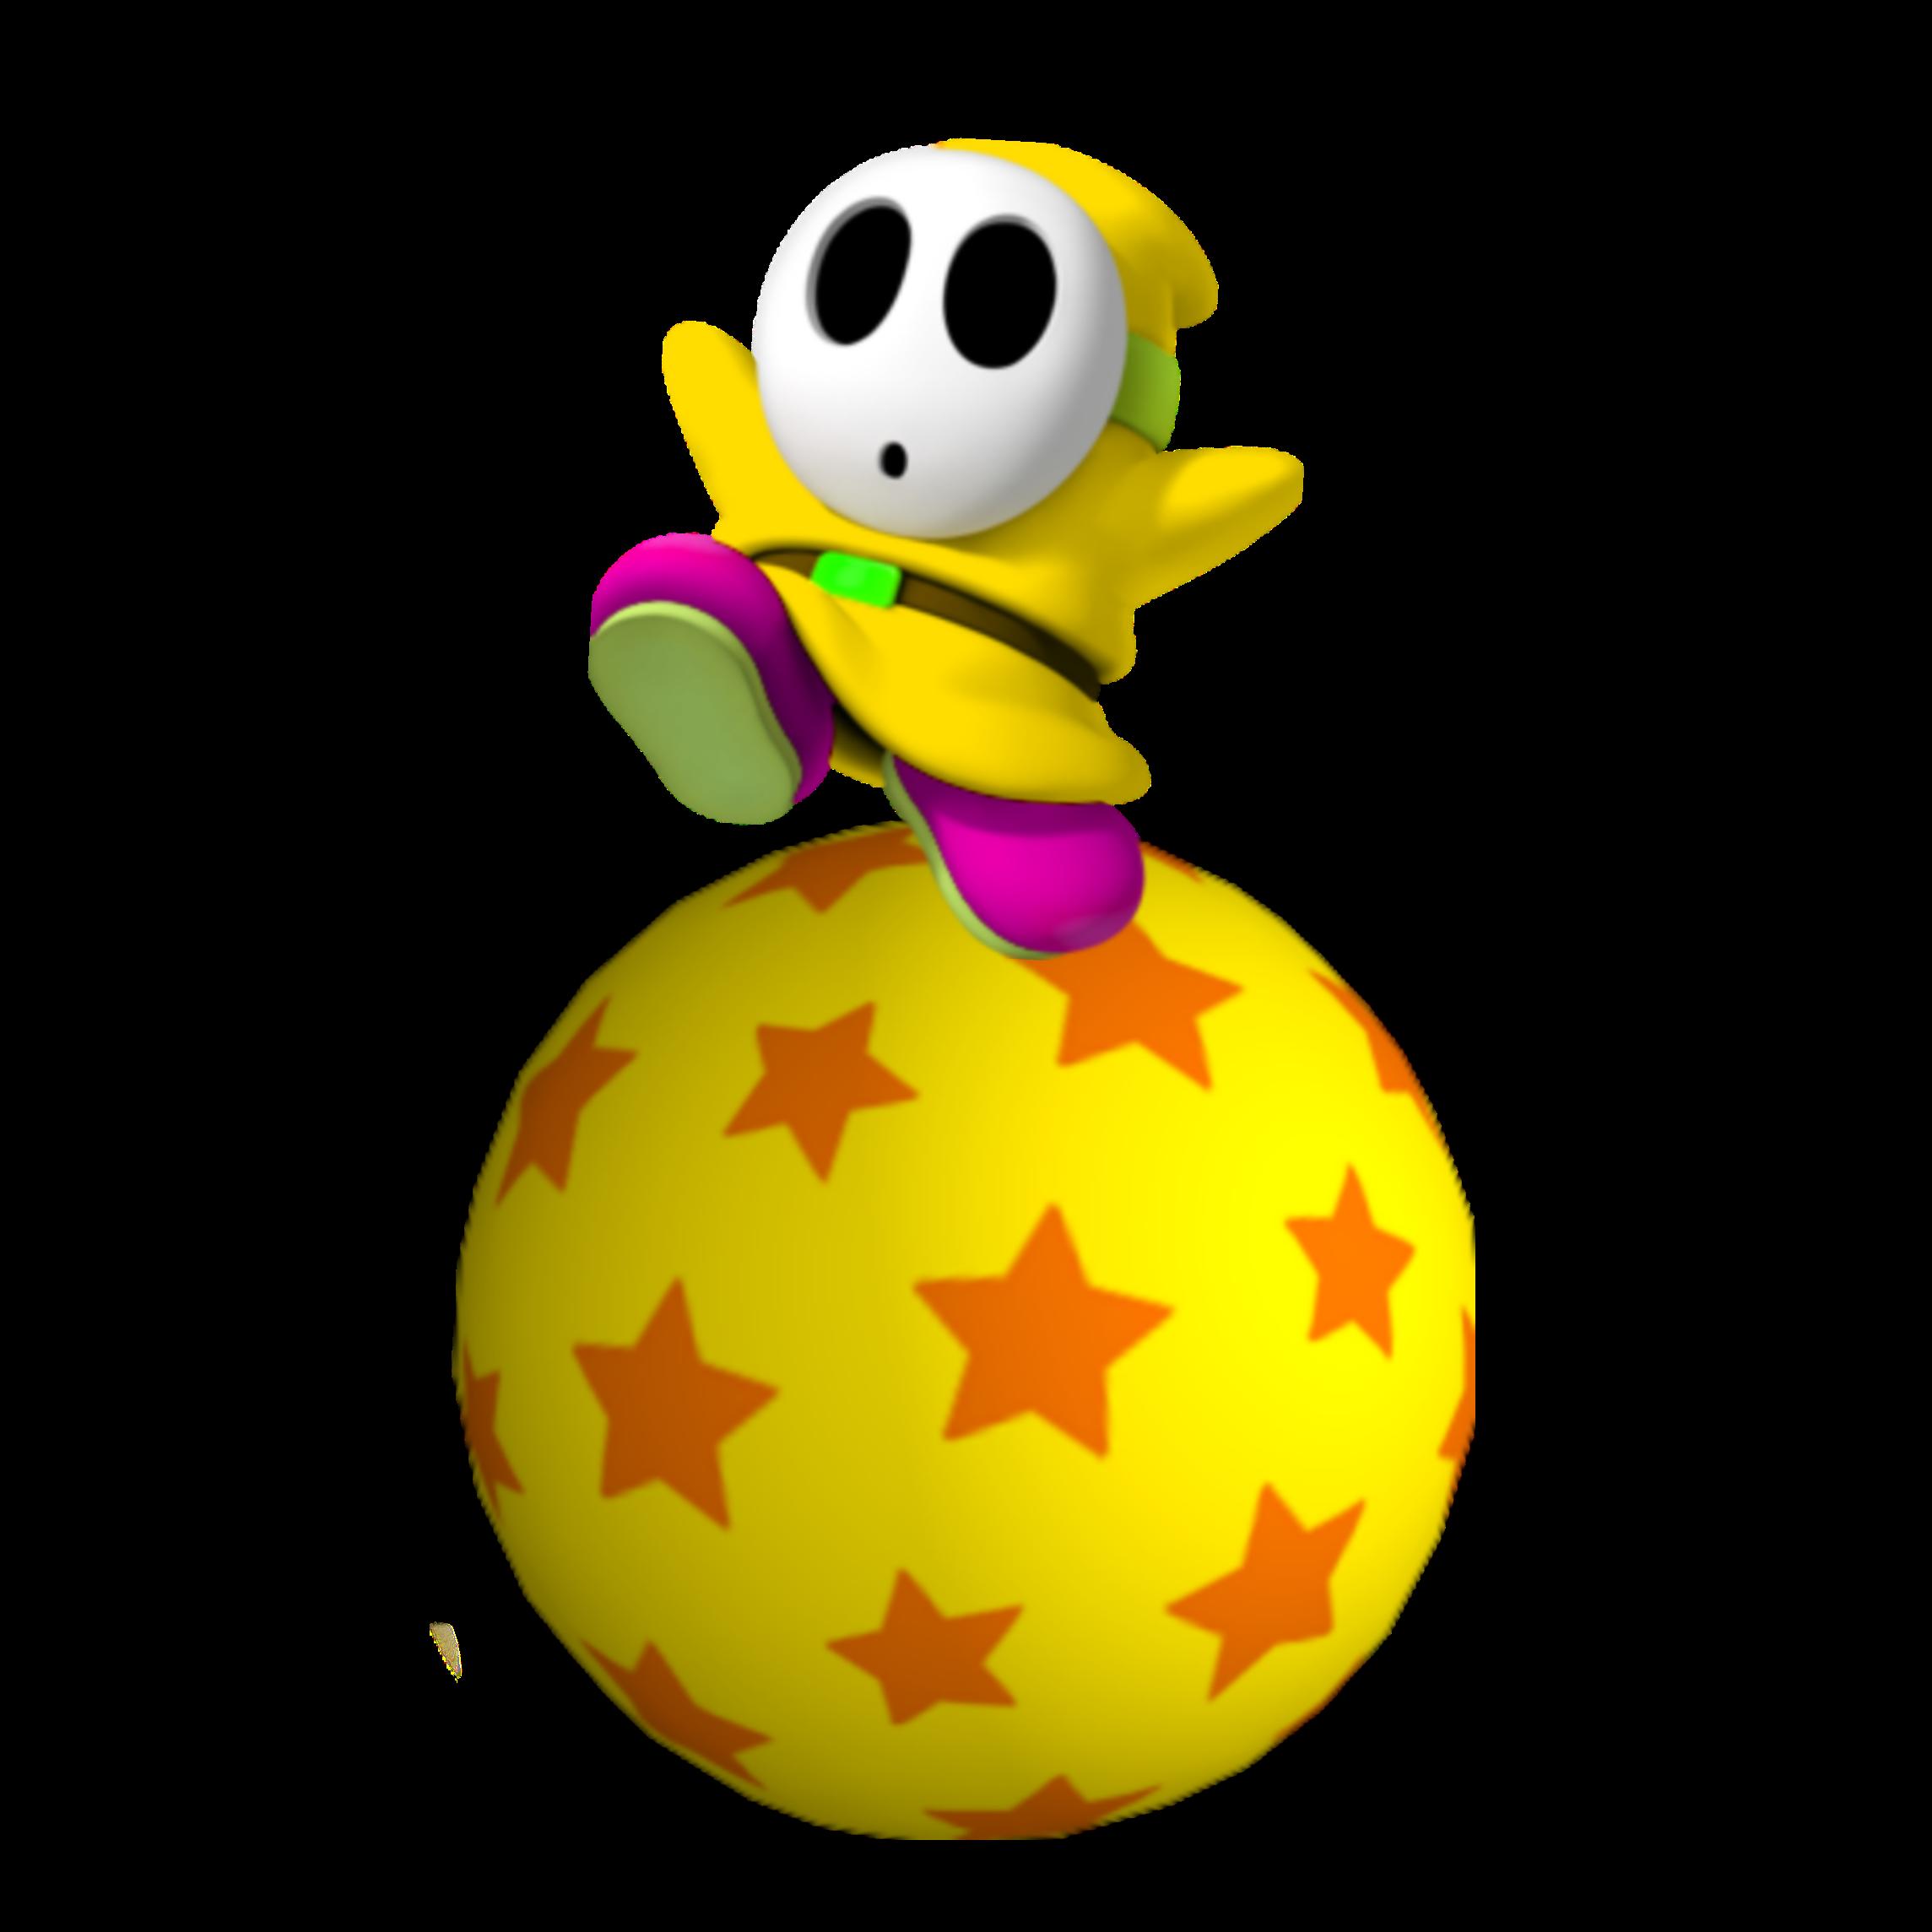 Ball Shy Guy